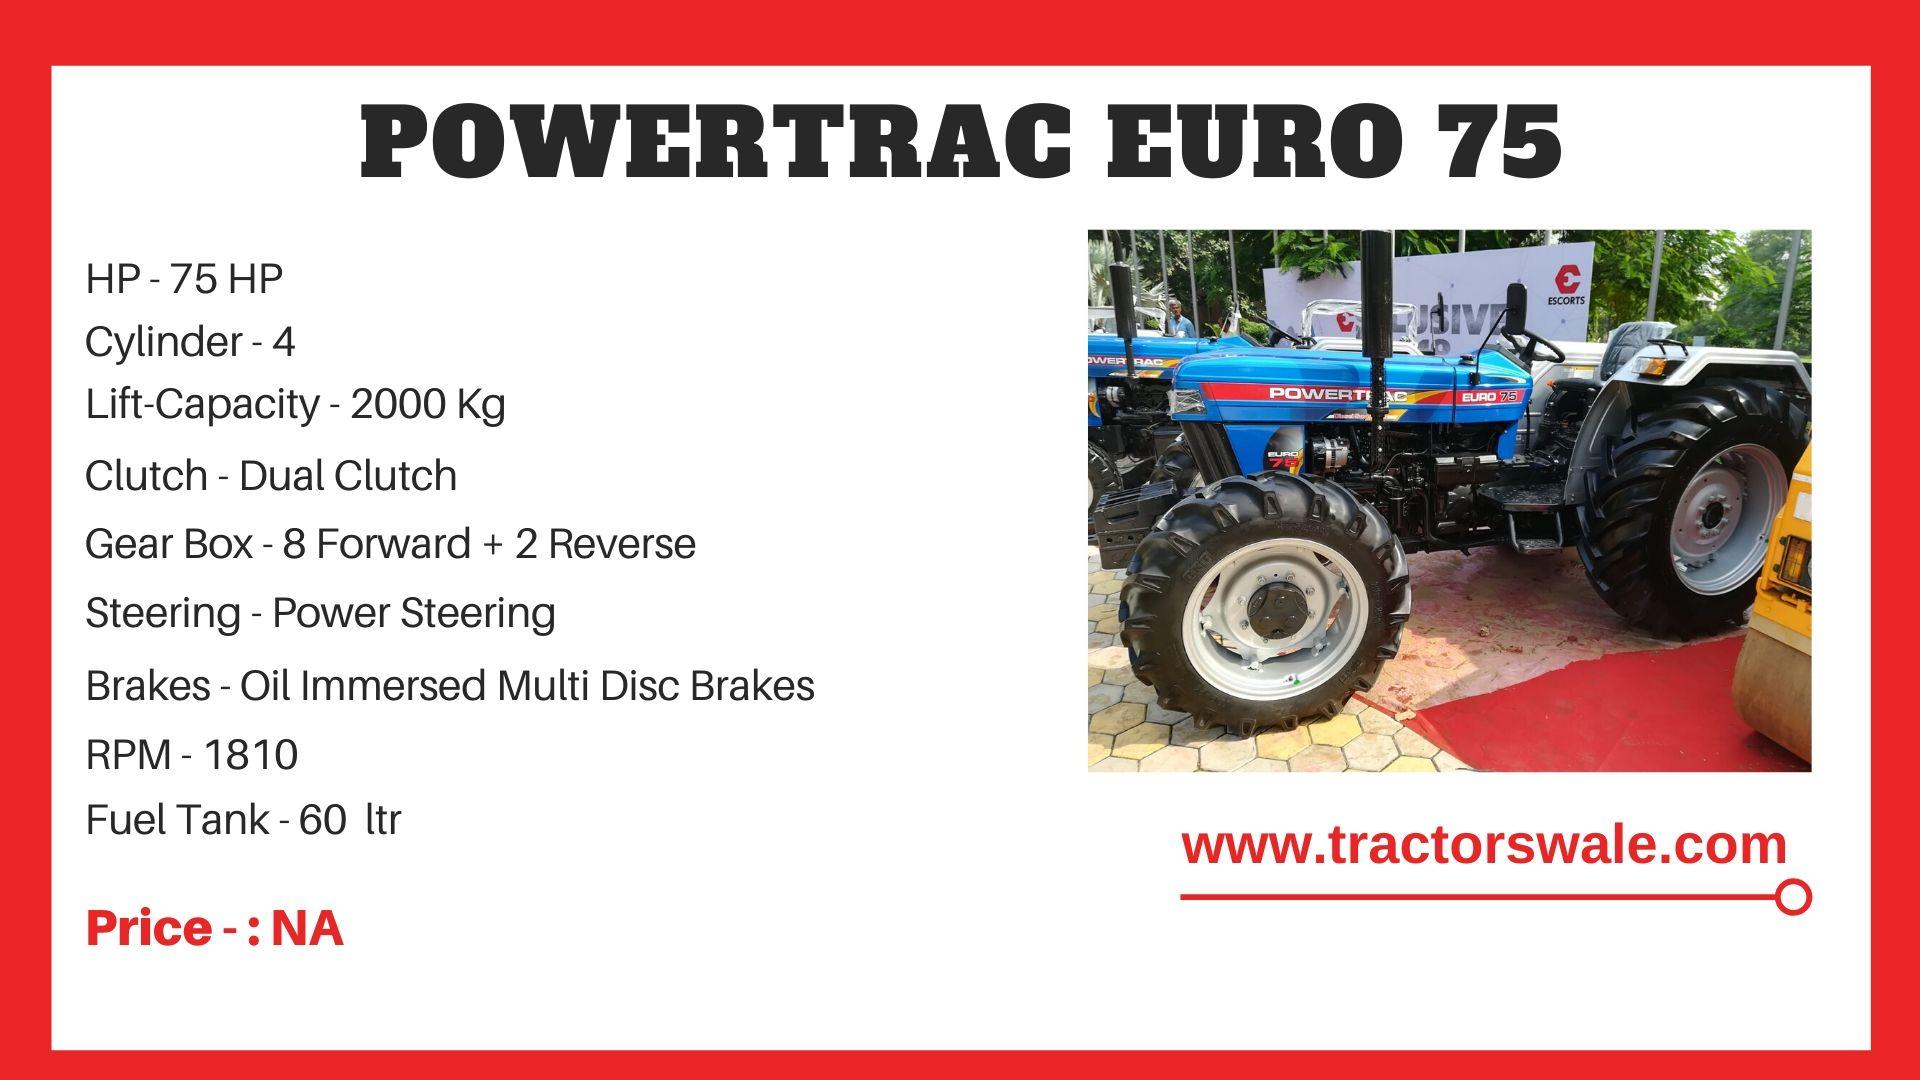 PowerTrac Euro 75 Tractor price